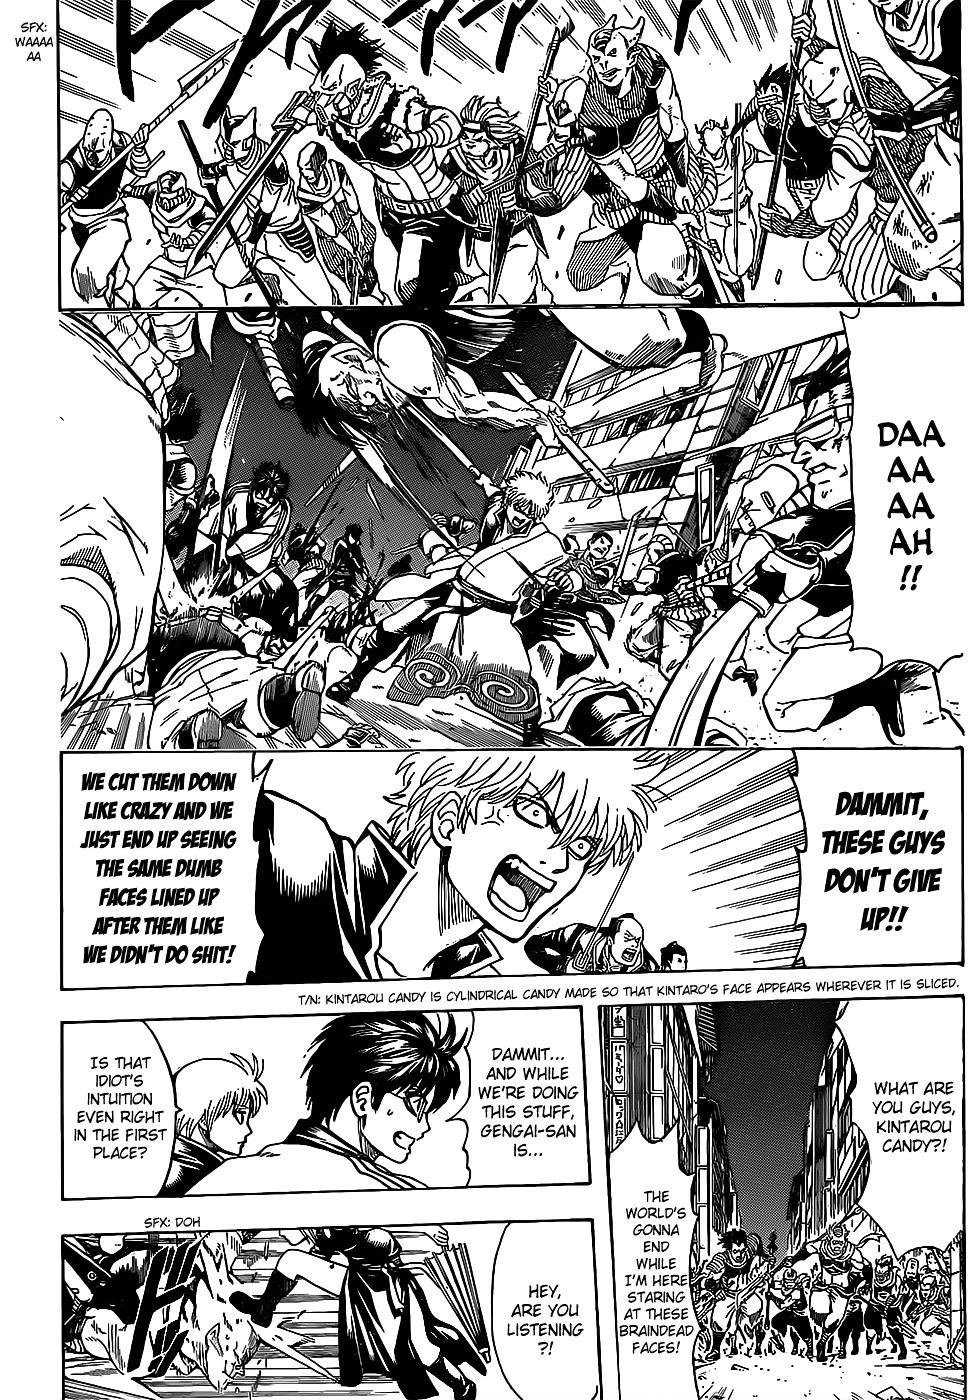 Gintama Chapter 634.2  Online Free Manga Read Image 4